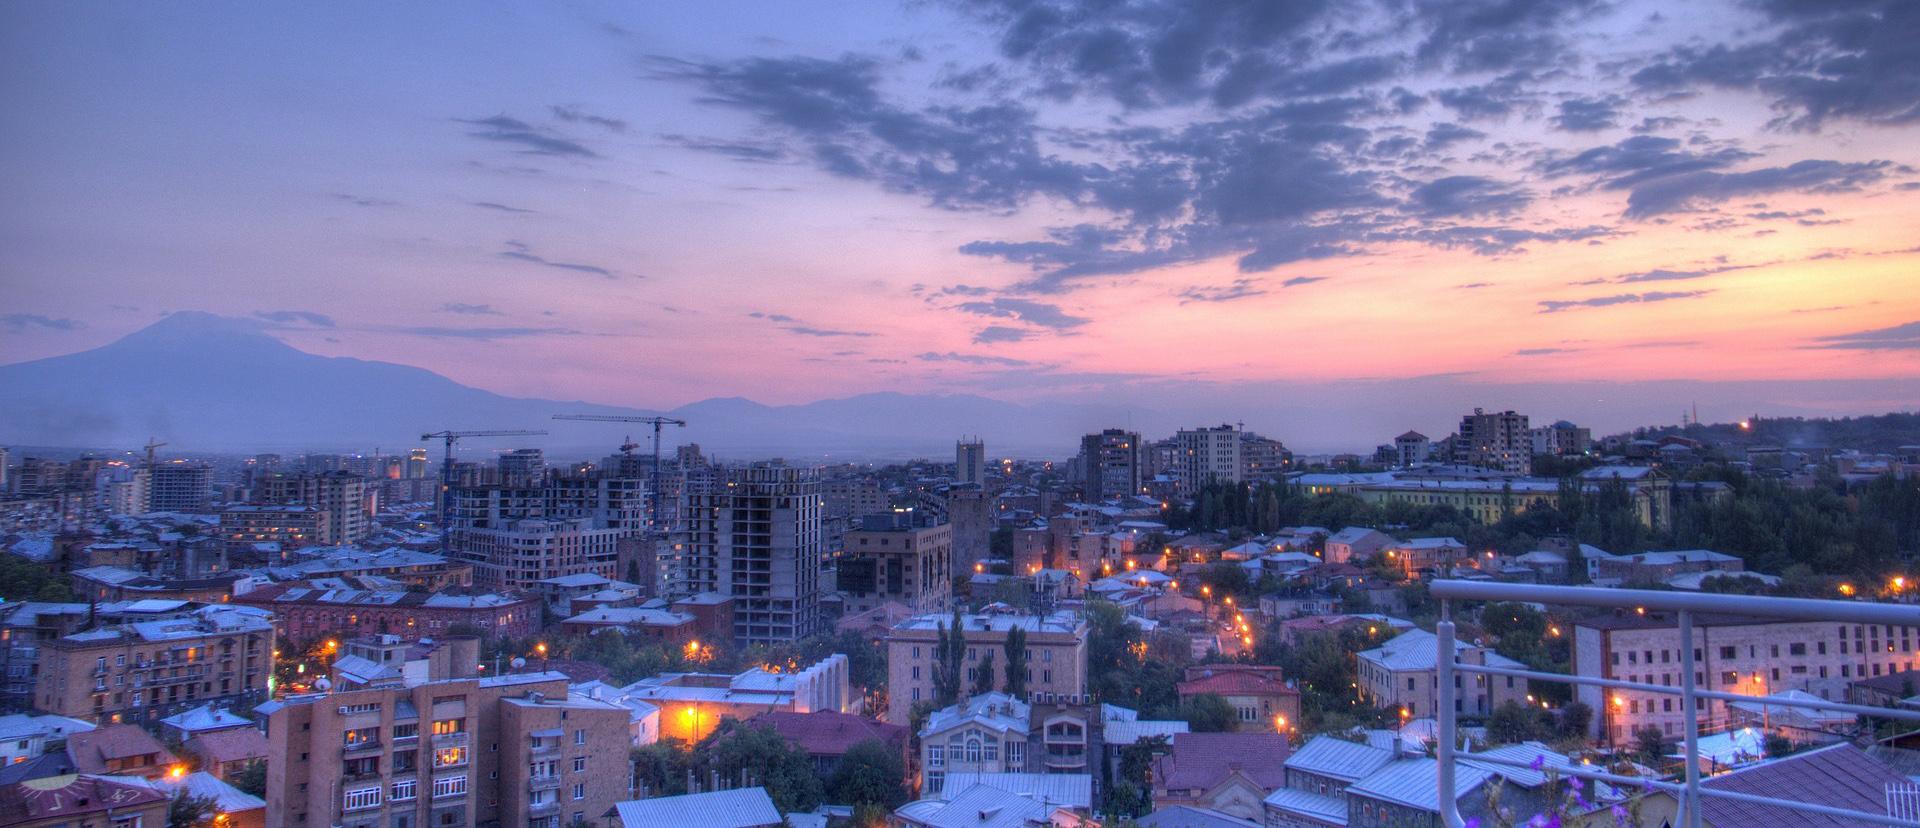 Undiscovered Armenia: With Germania to Yerevan